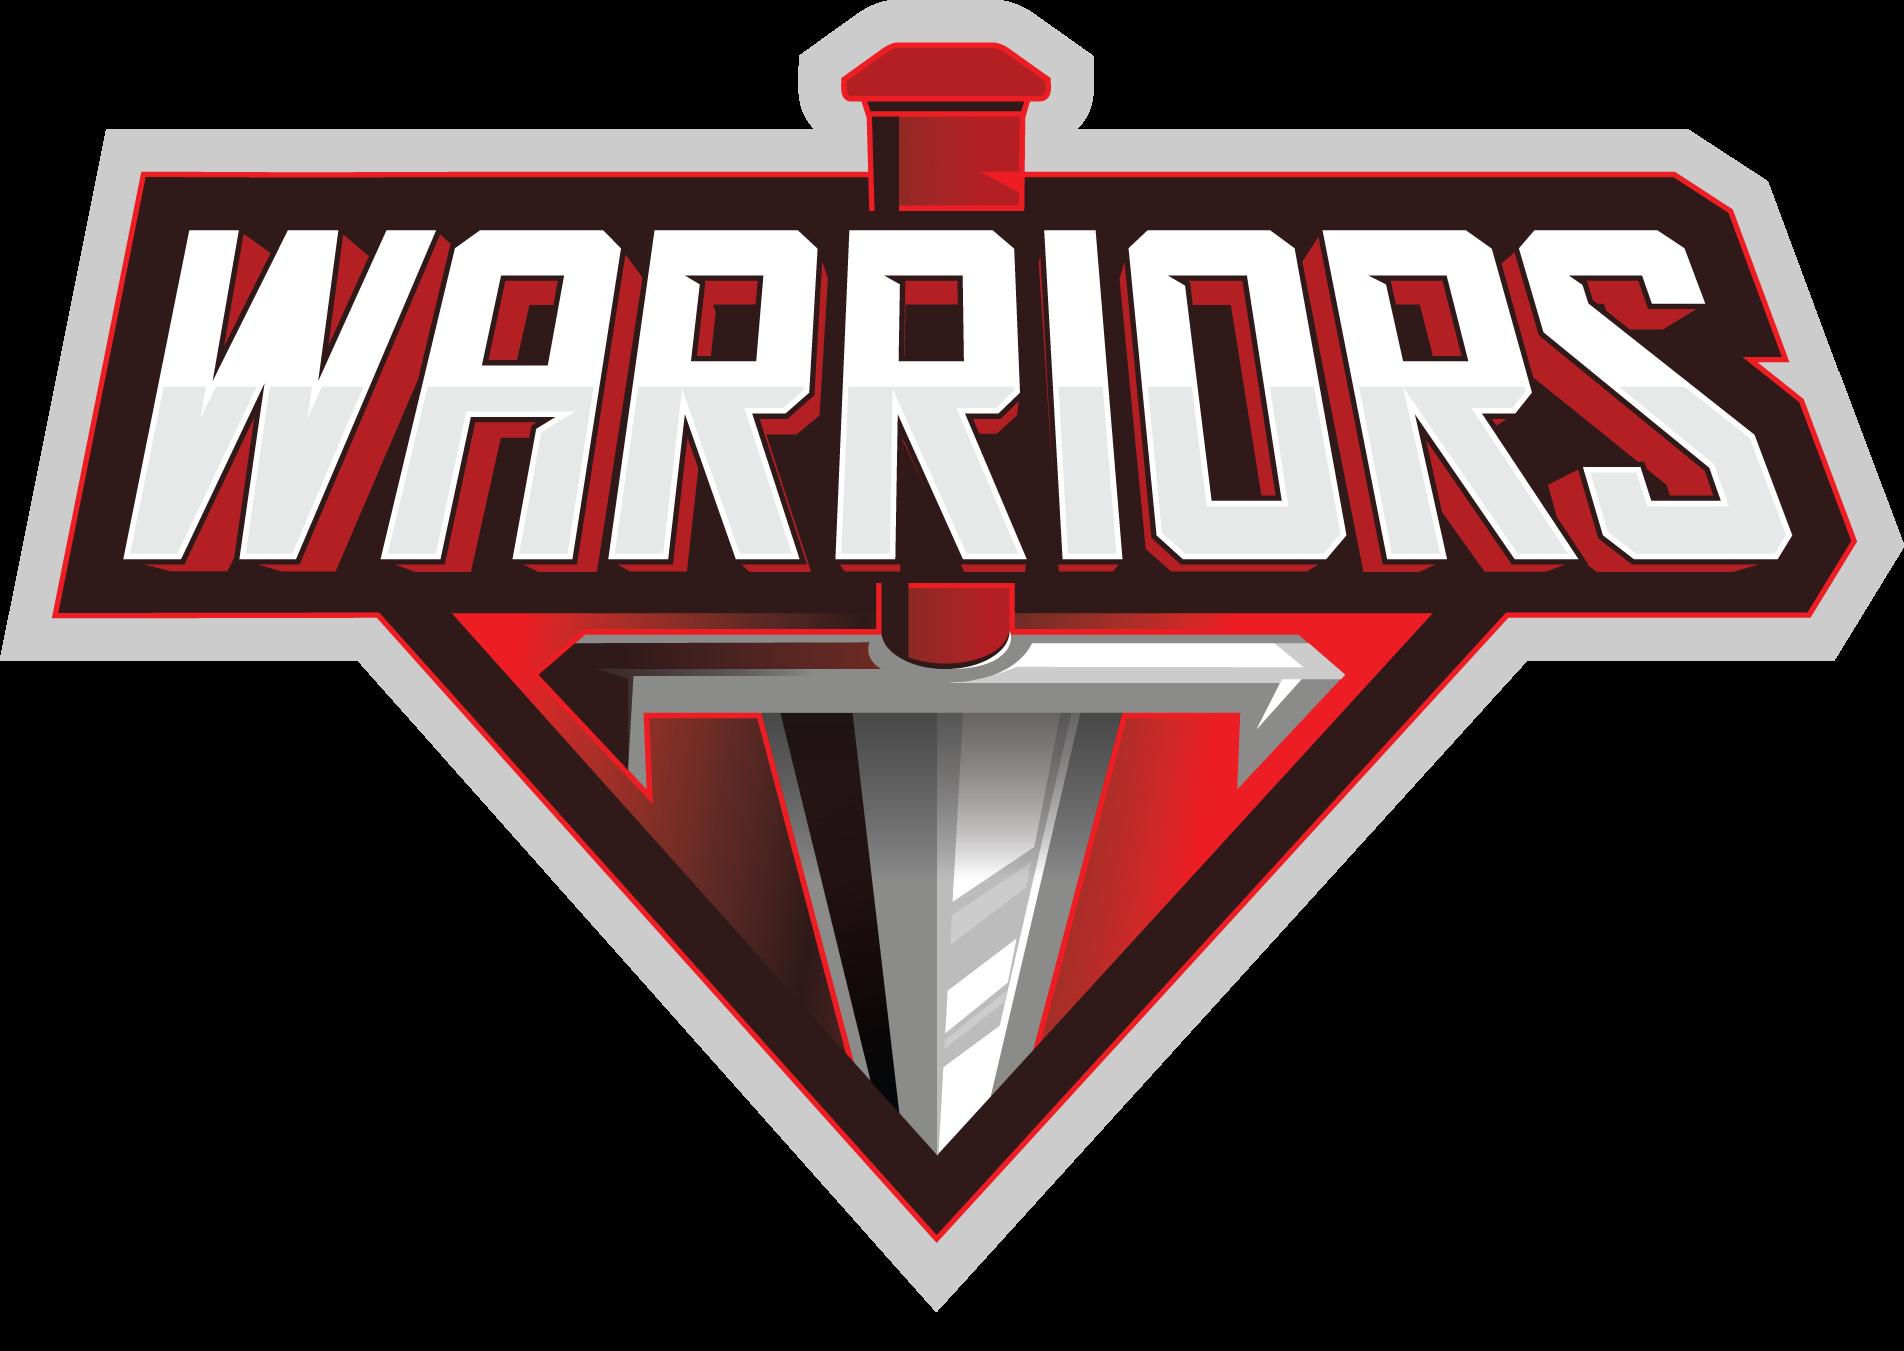 Shotmakers Golf Channel Gm 3800 Standalone Wiring Harness Team Warriors